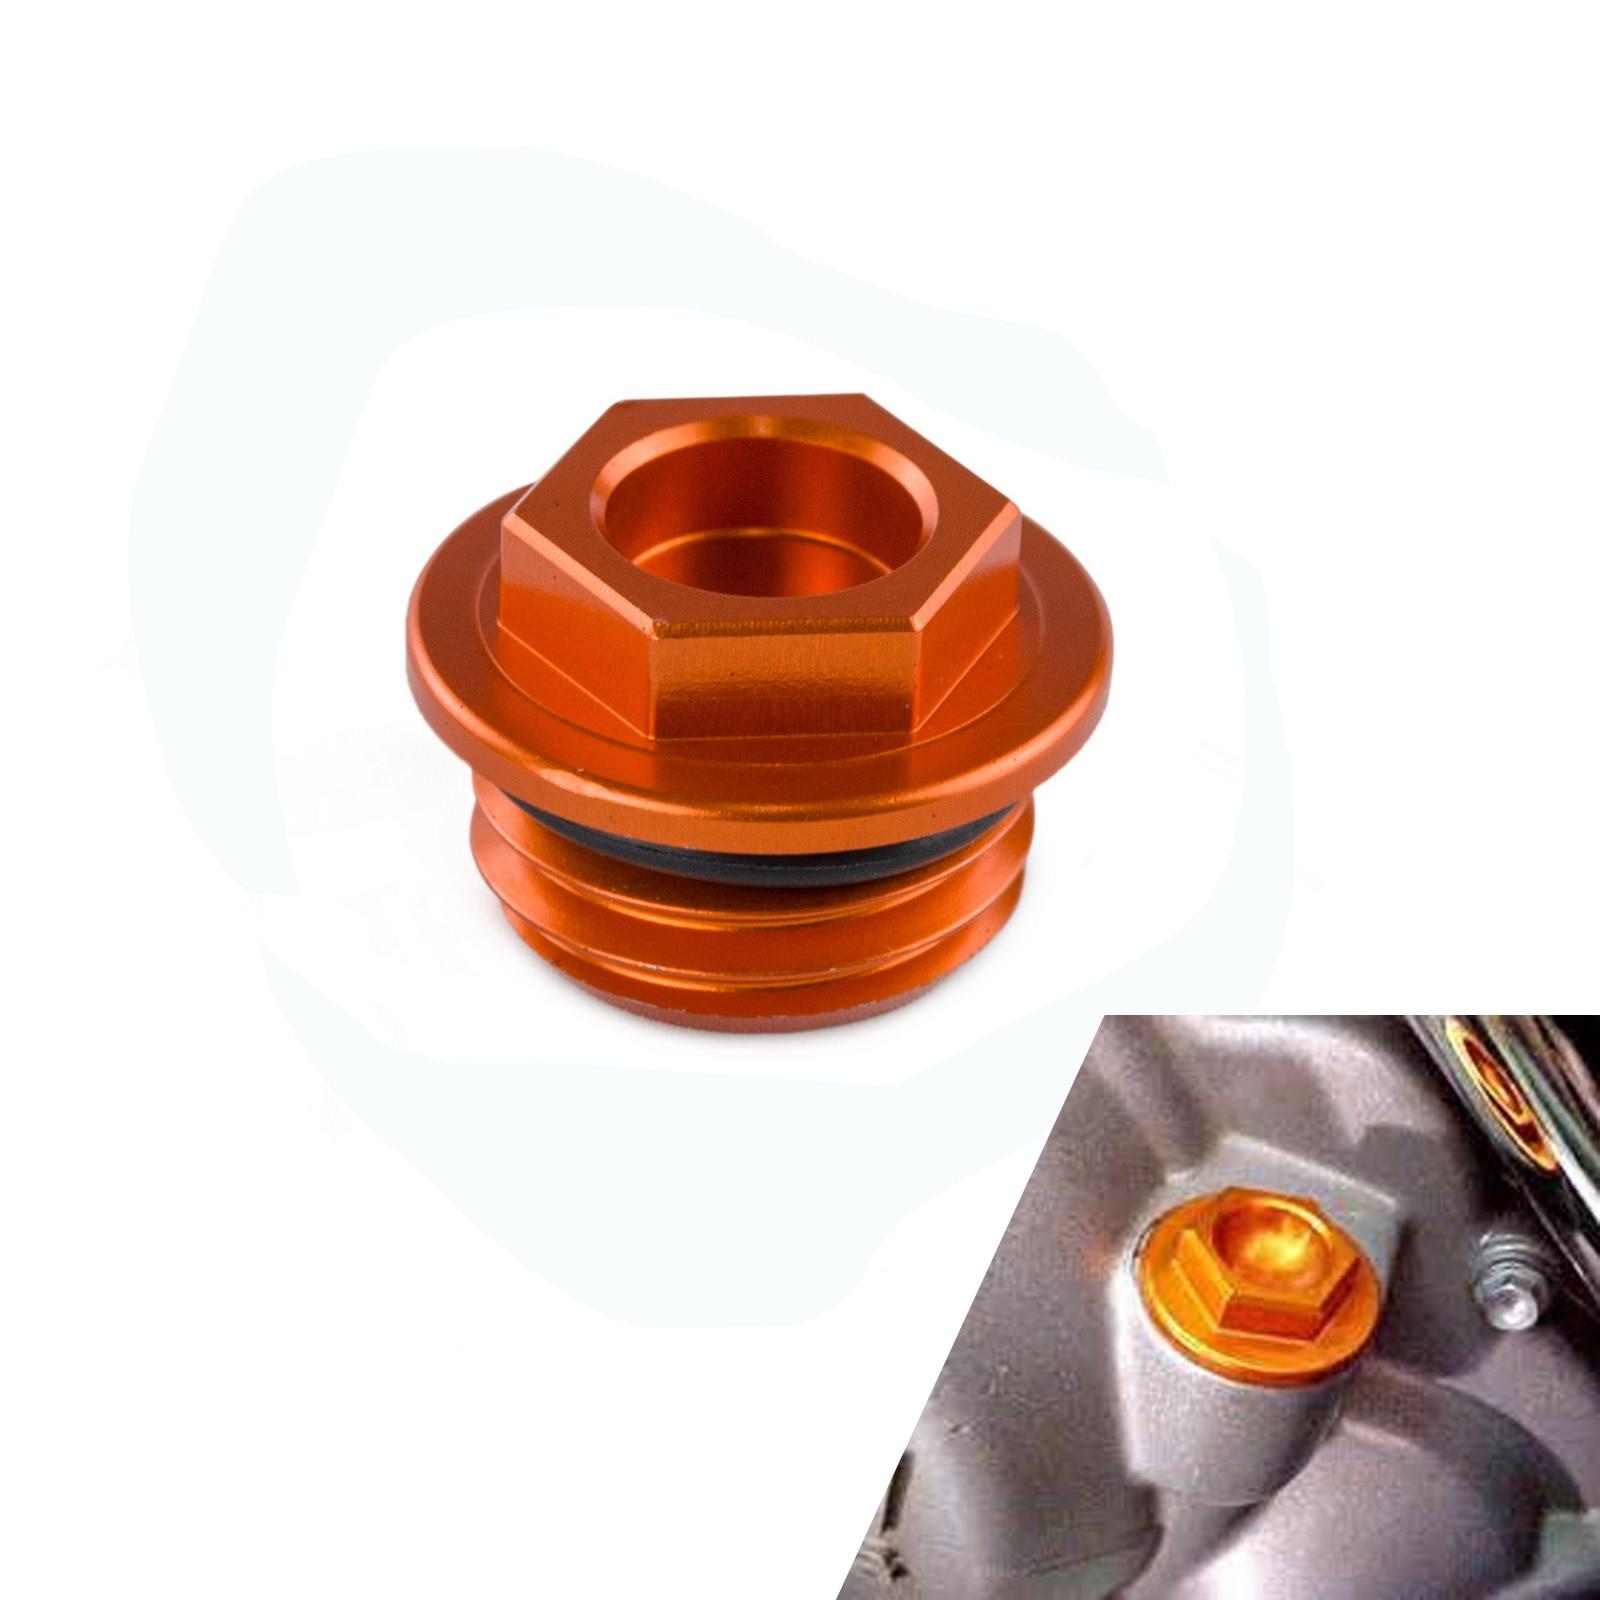 NICECNC Oil Filler Plug Cap For KTM 50 125 200 250 300 350 450 550 620 660 690 1290 SX SXF XC XCF EXC Supermoto LC4 SMC Duke